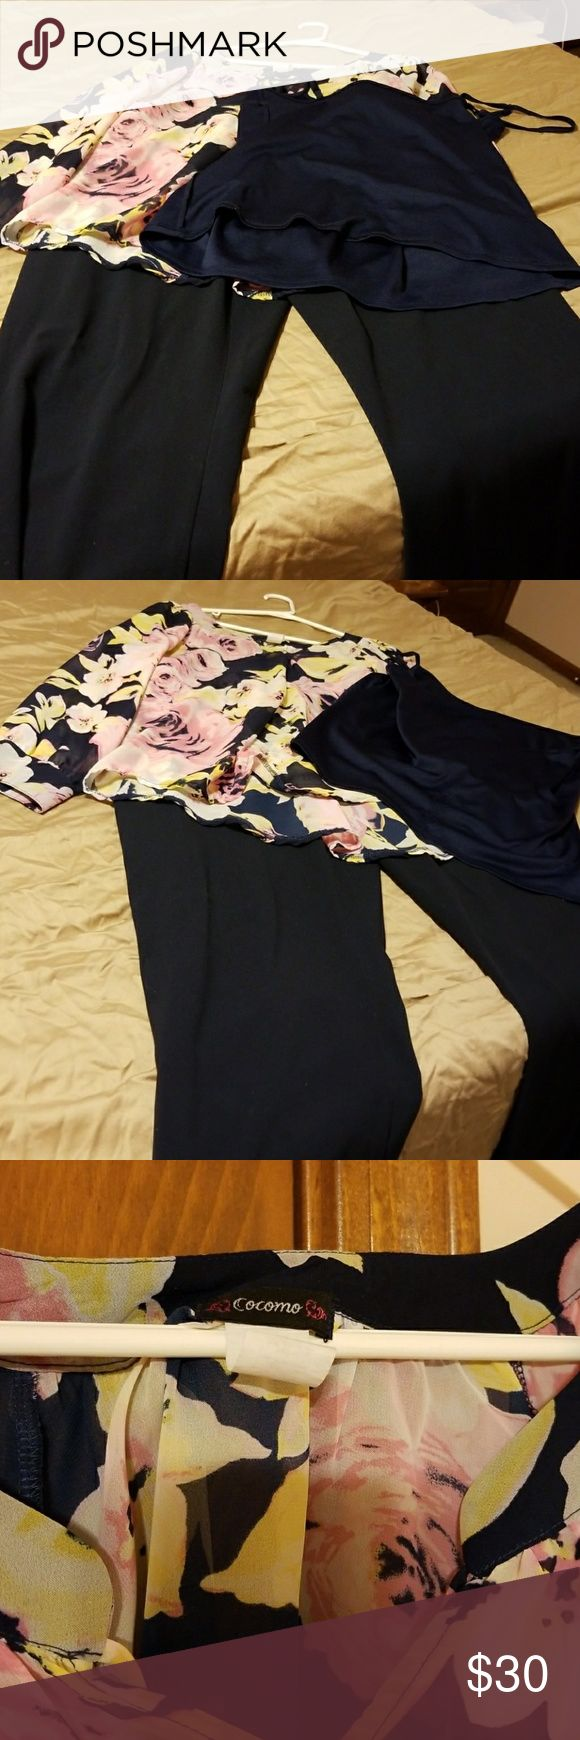 Sheer navy/pink tunic, cami, navy 16w dress pants DoCoMo sheer navy and pink tunic with navy cami and navy 16w dress pants. Nice outfit! Worn 2x. Dress pants are 16w Worthington stretch. Cocomo Tops Tunics